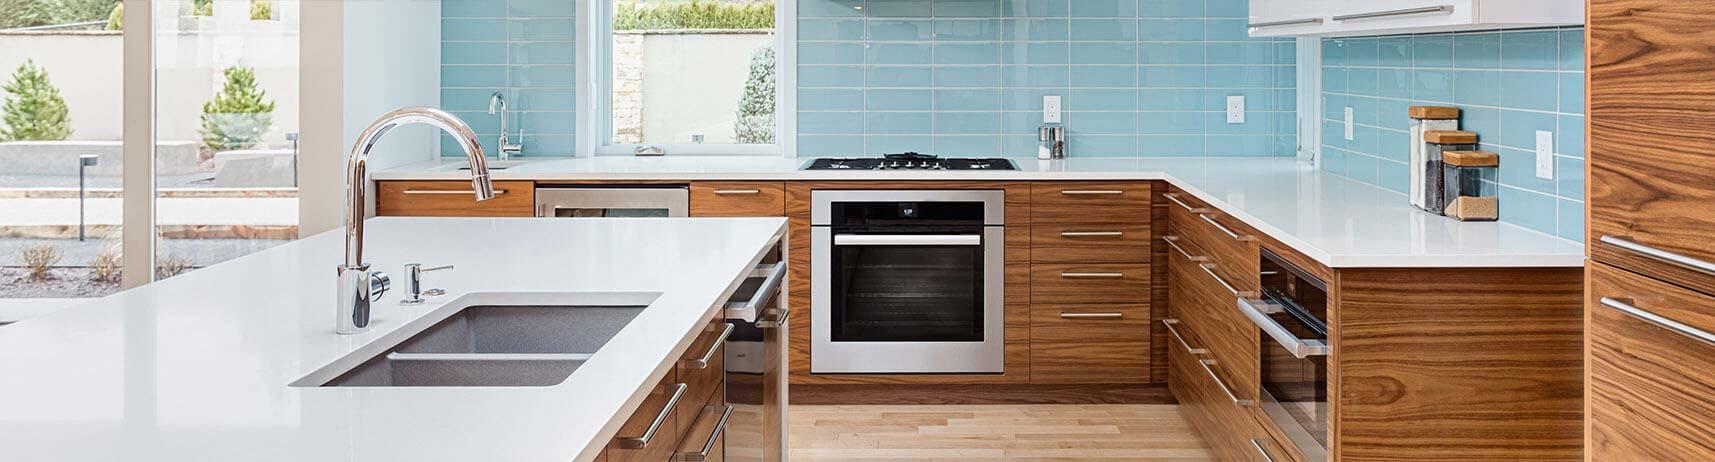 Williamsburg General Contractor, Home Remodeling Contractor and Kitchen Remodeling Contractor